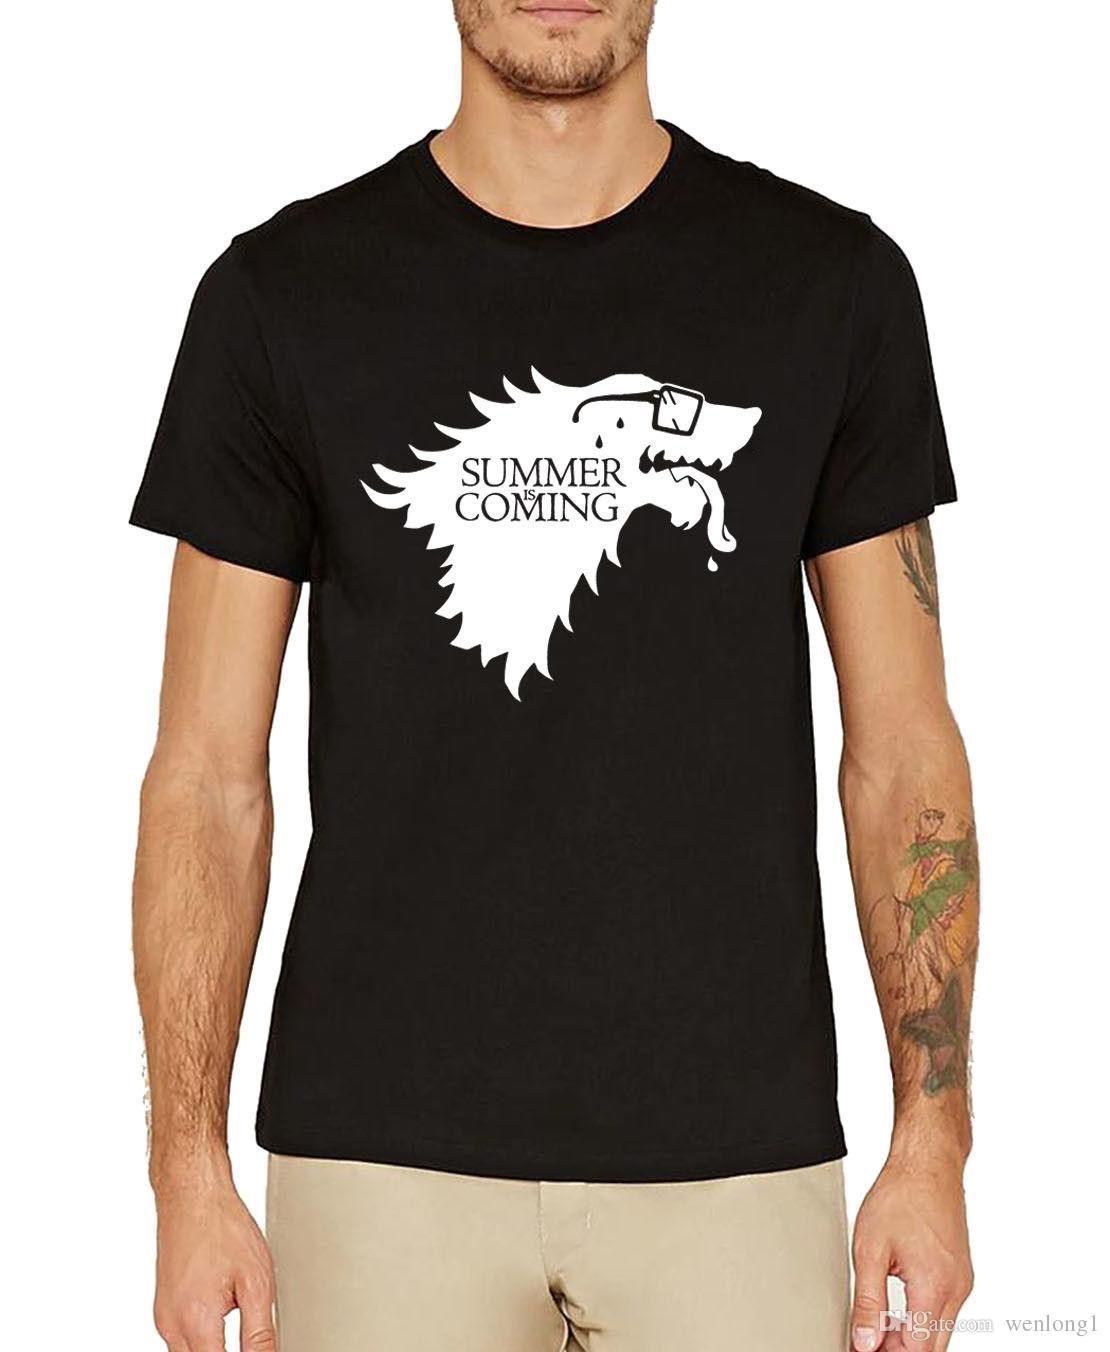 6512302a4 Funny Summer Is Coming T Shirt Men Game Of Thrones Fans Hilarious Stark Shirt  T Shirt Fashion Top Tee Harajuku Crazy T Shirt T Shir From Jie20, ...